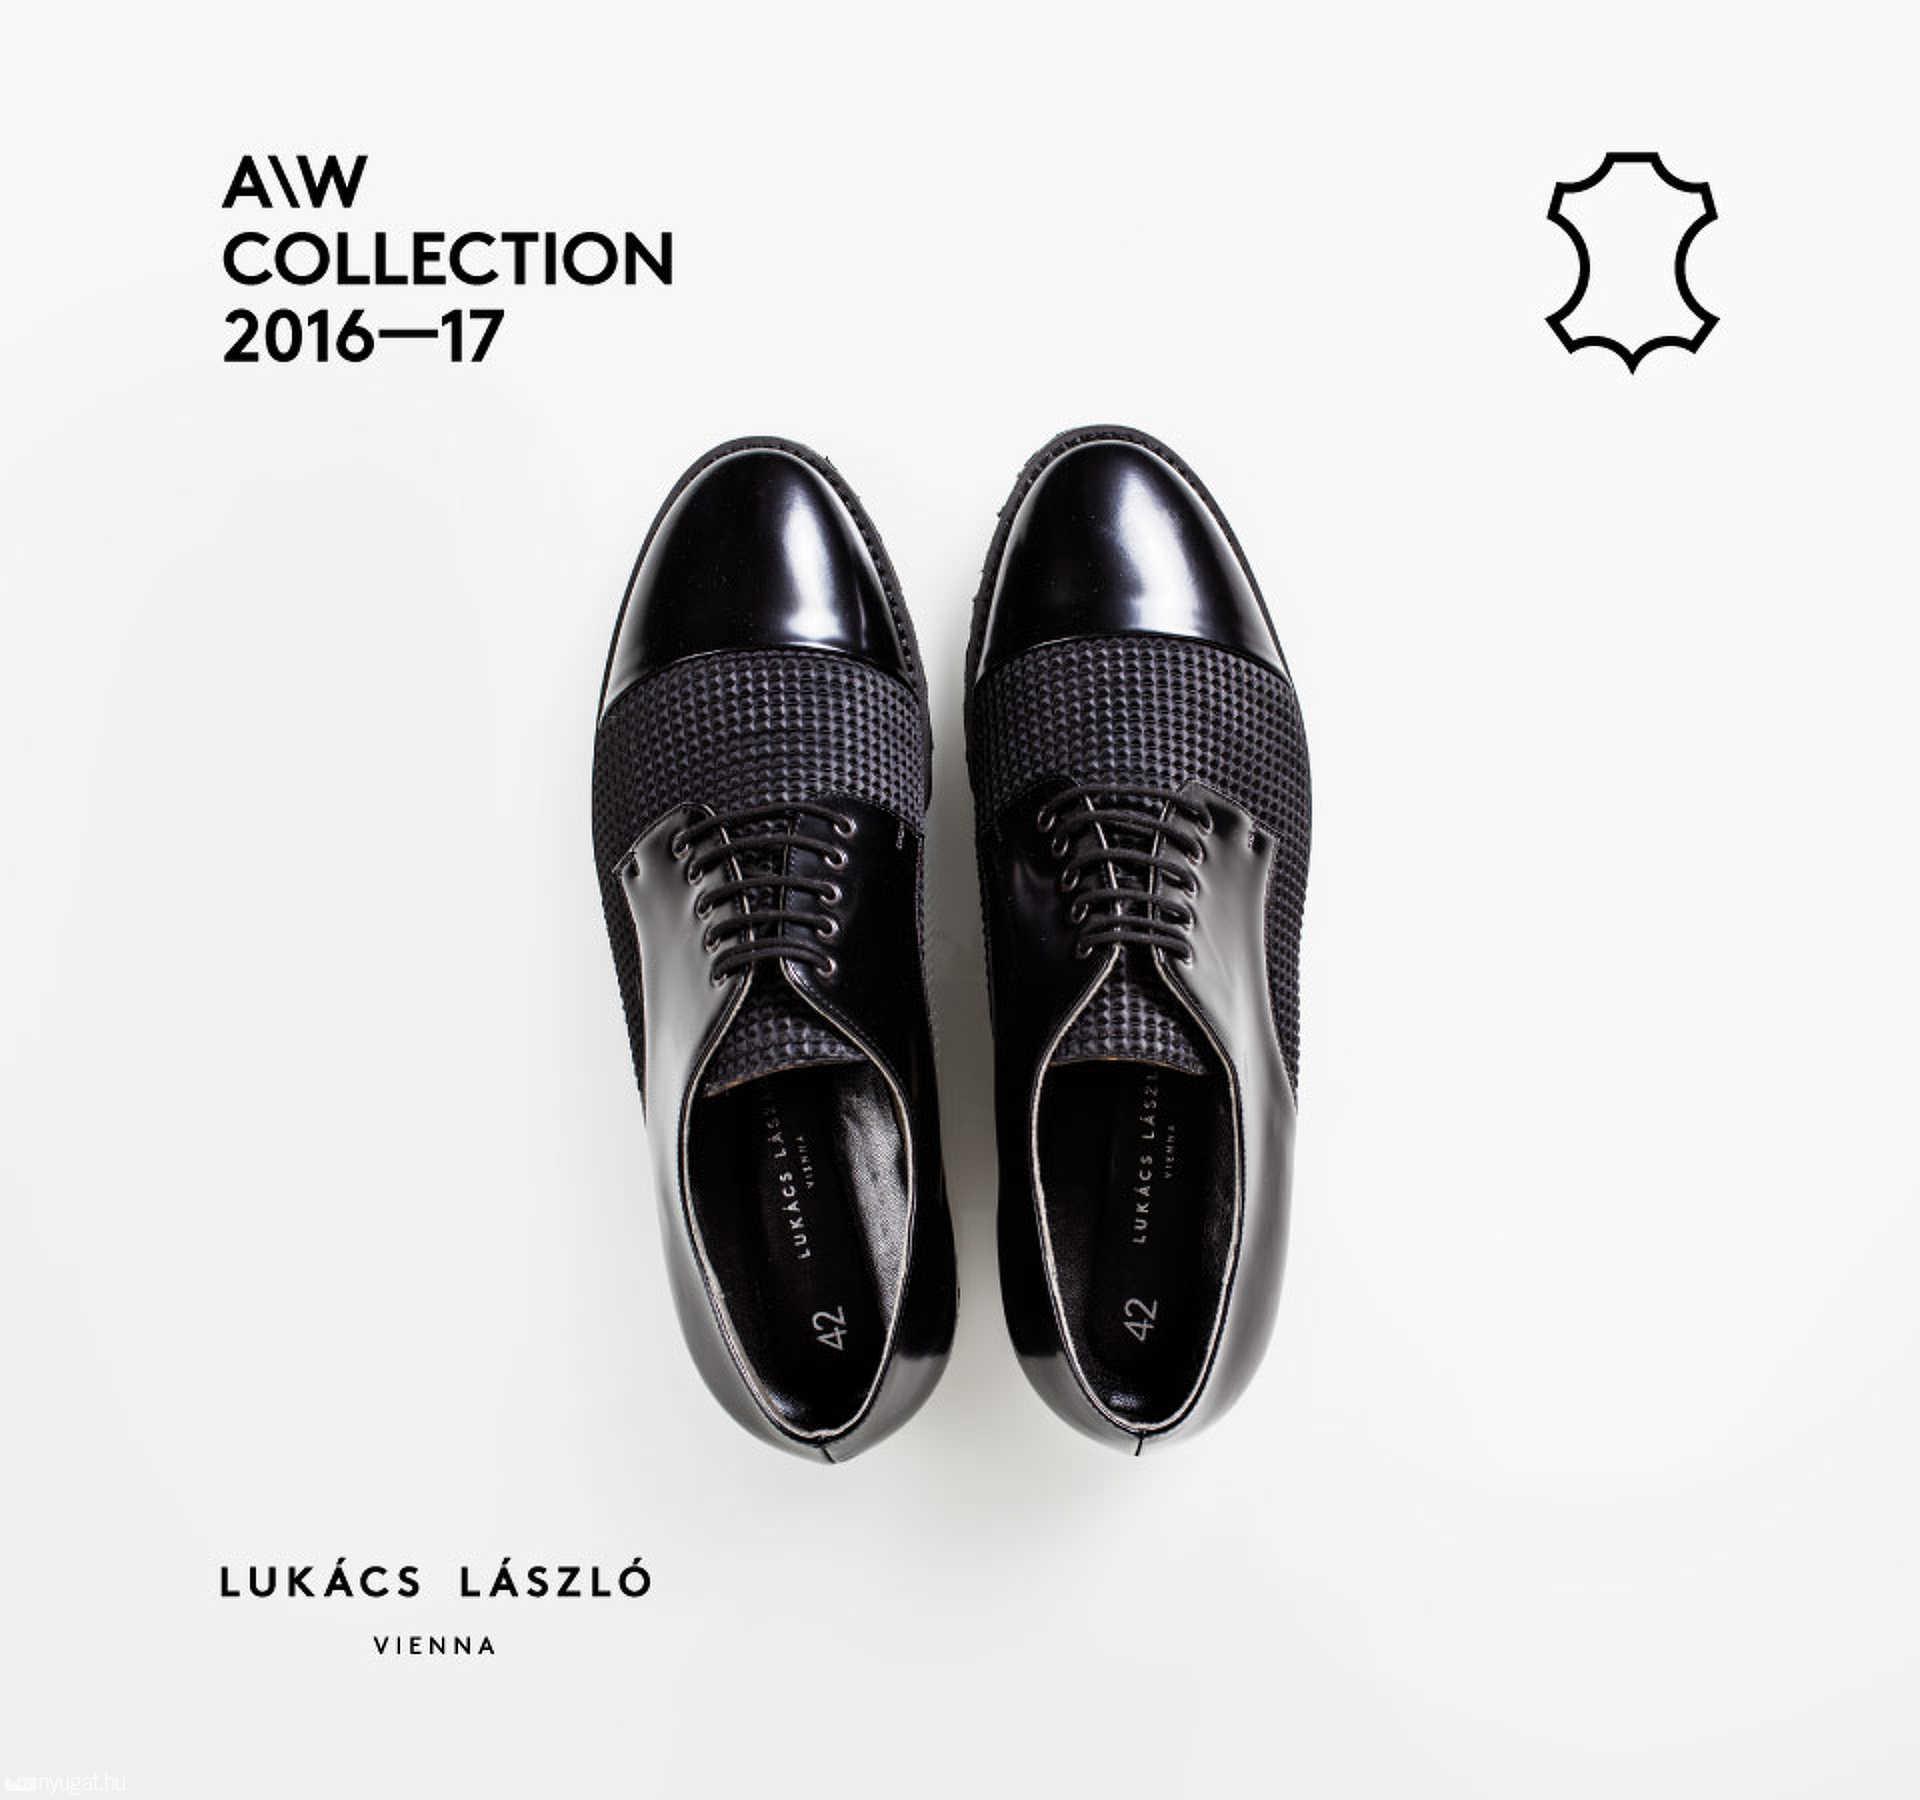 Lukács László Vienna Shoting AW 2016/17